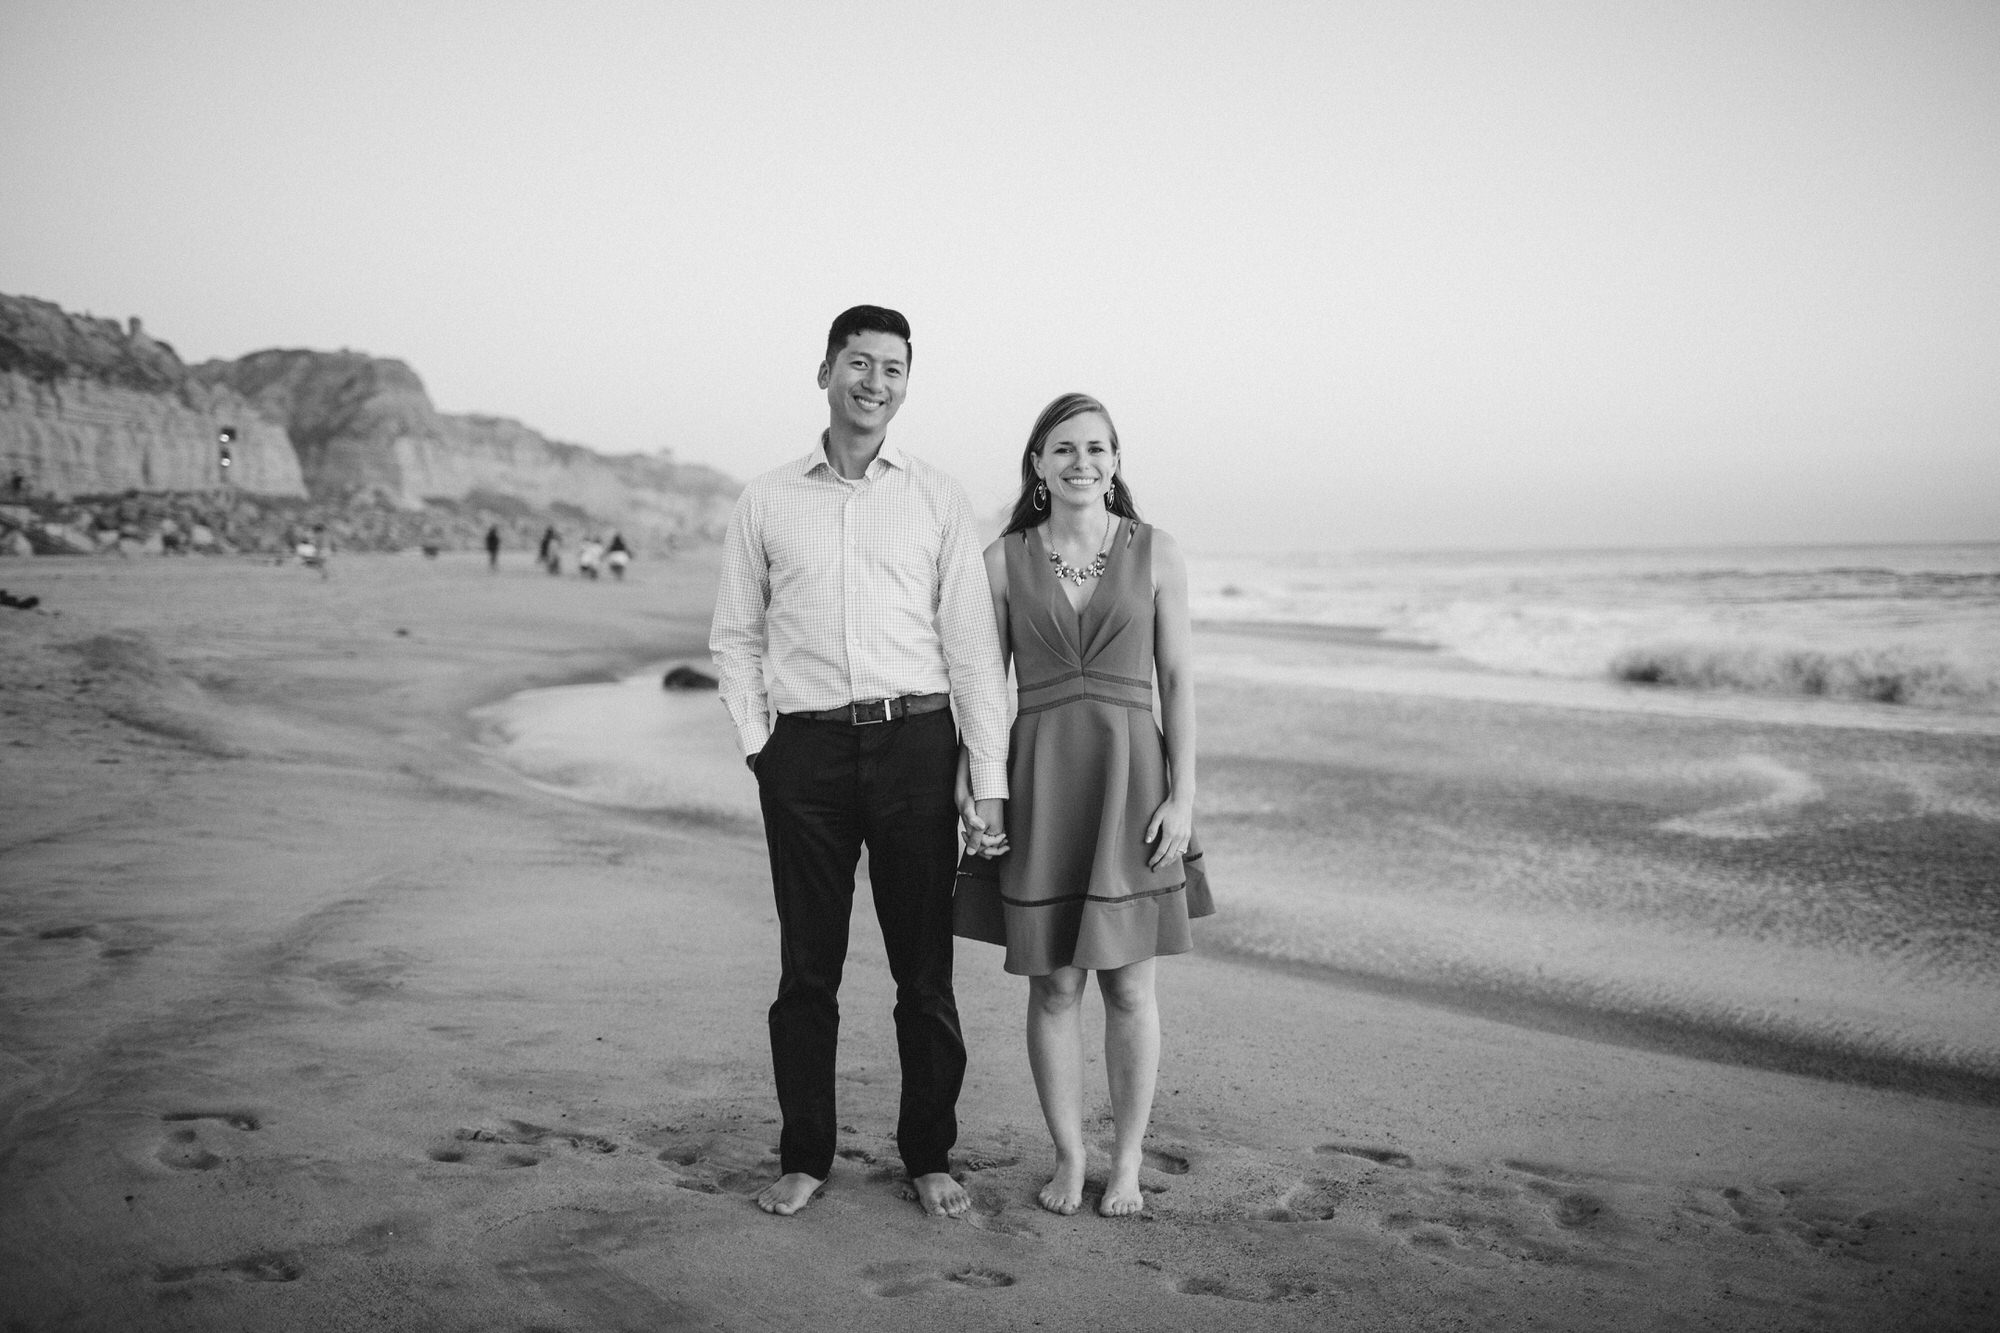 San-Clemente-engagement-22.jpg